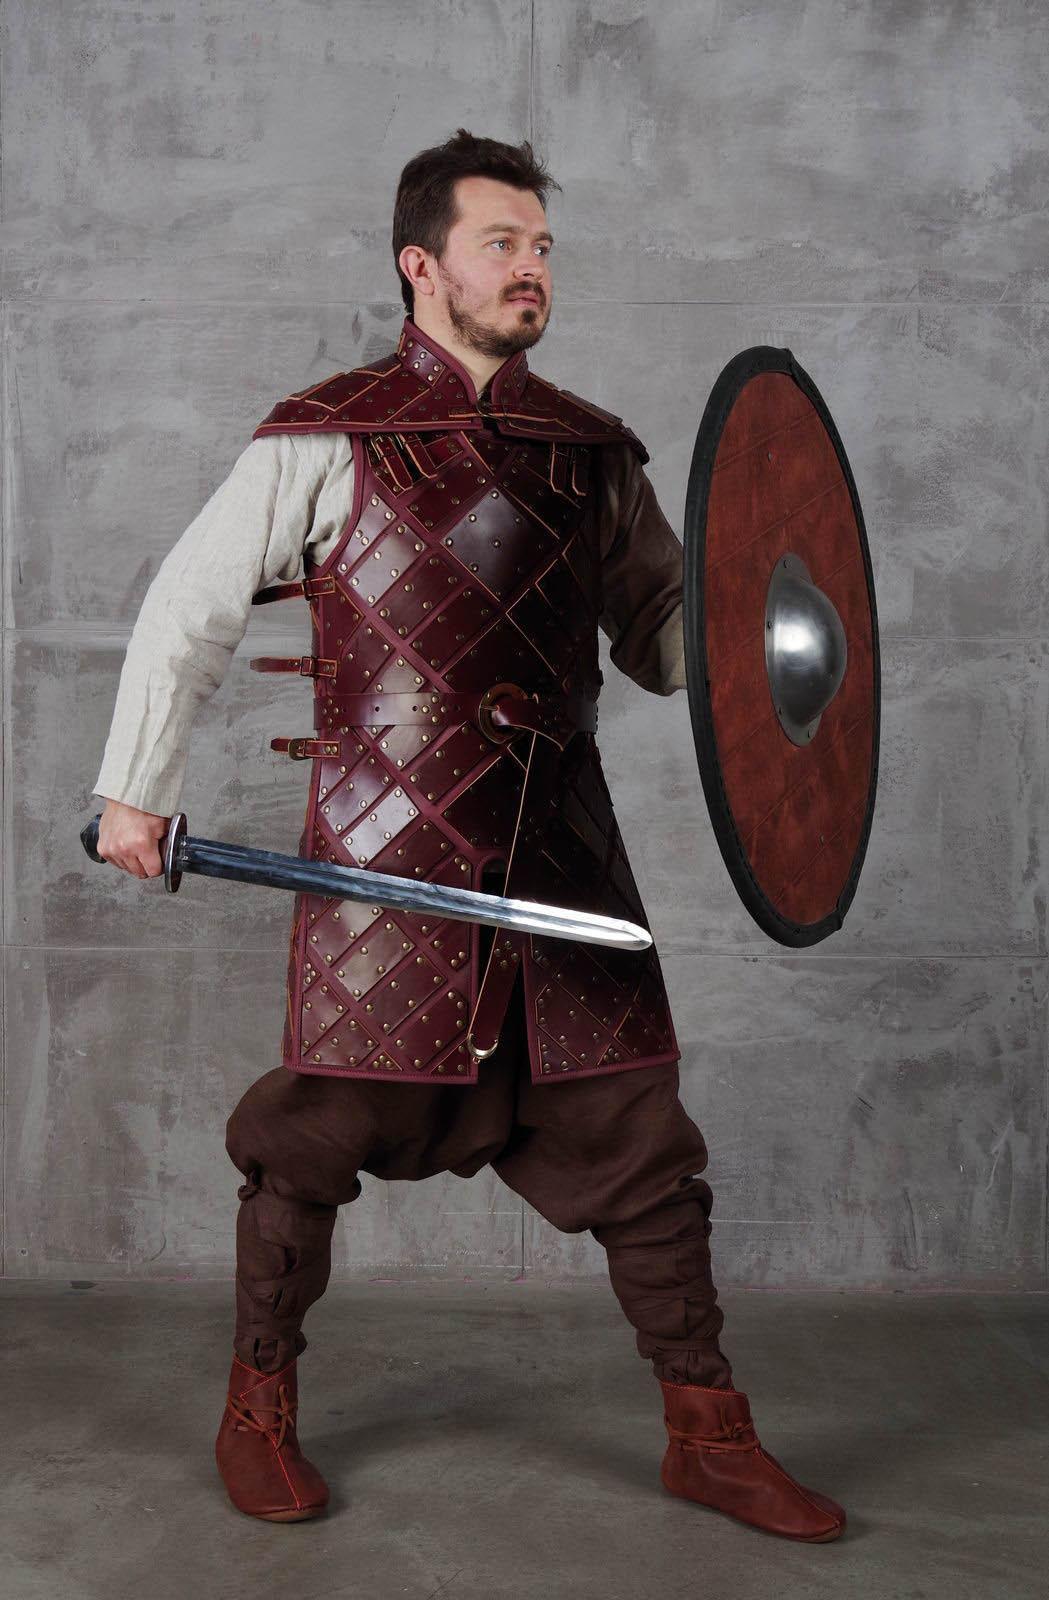 Set Of Leather Armour In Style Of Jon Snow Jon snow x daenerys targaryen daenerys targaryen x jon snow jon x daenerys daenerys x jon jon stark x daenerys targaryen ice and fire the dragon and the wolf game of thrones. set of leather armour in style of jon snow